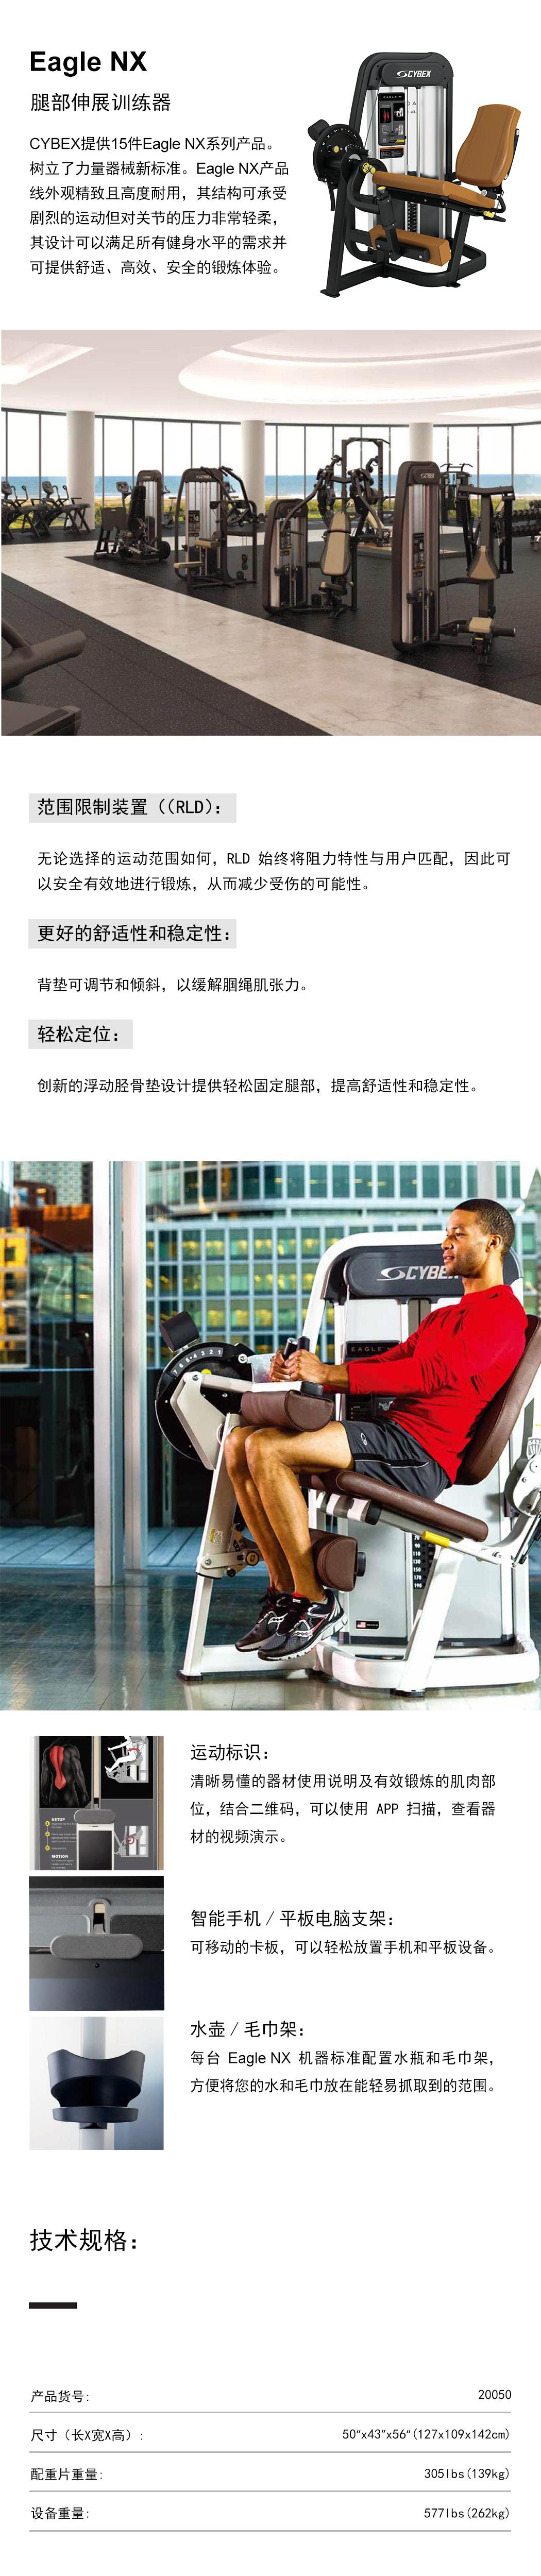 cybex-腿部伸展训练器.jpg